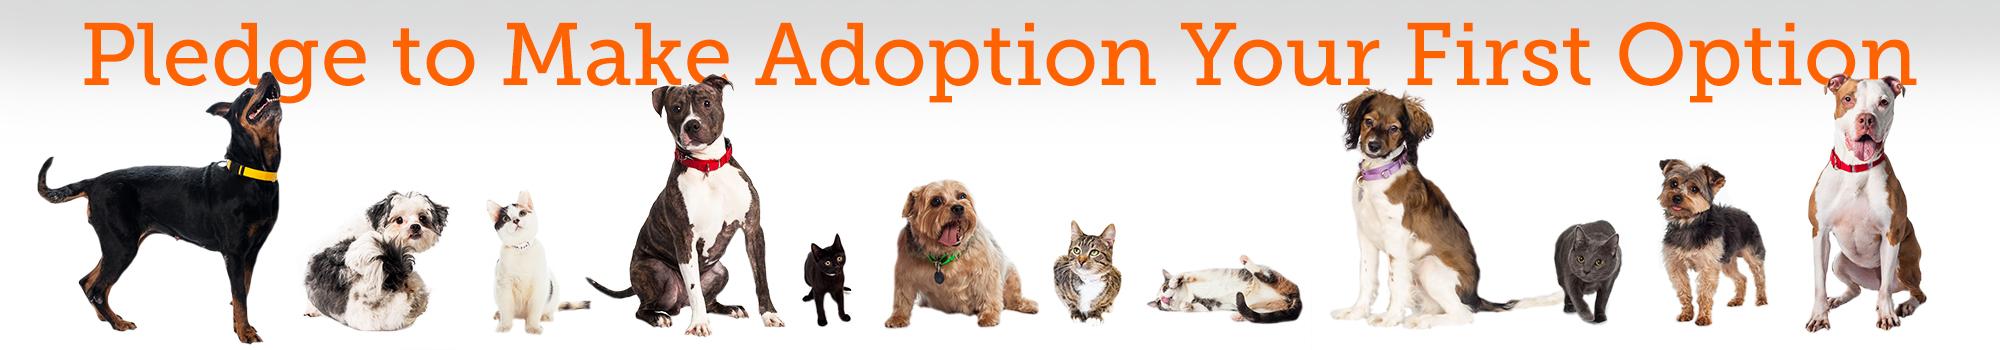 Pledge To Make Pet Adoption Your First Option L Aspca